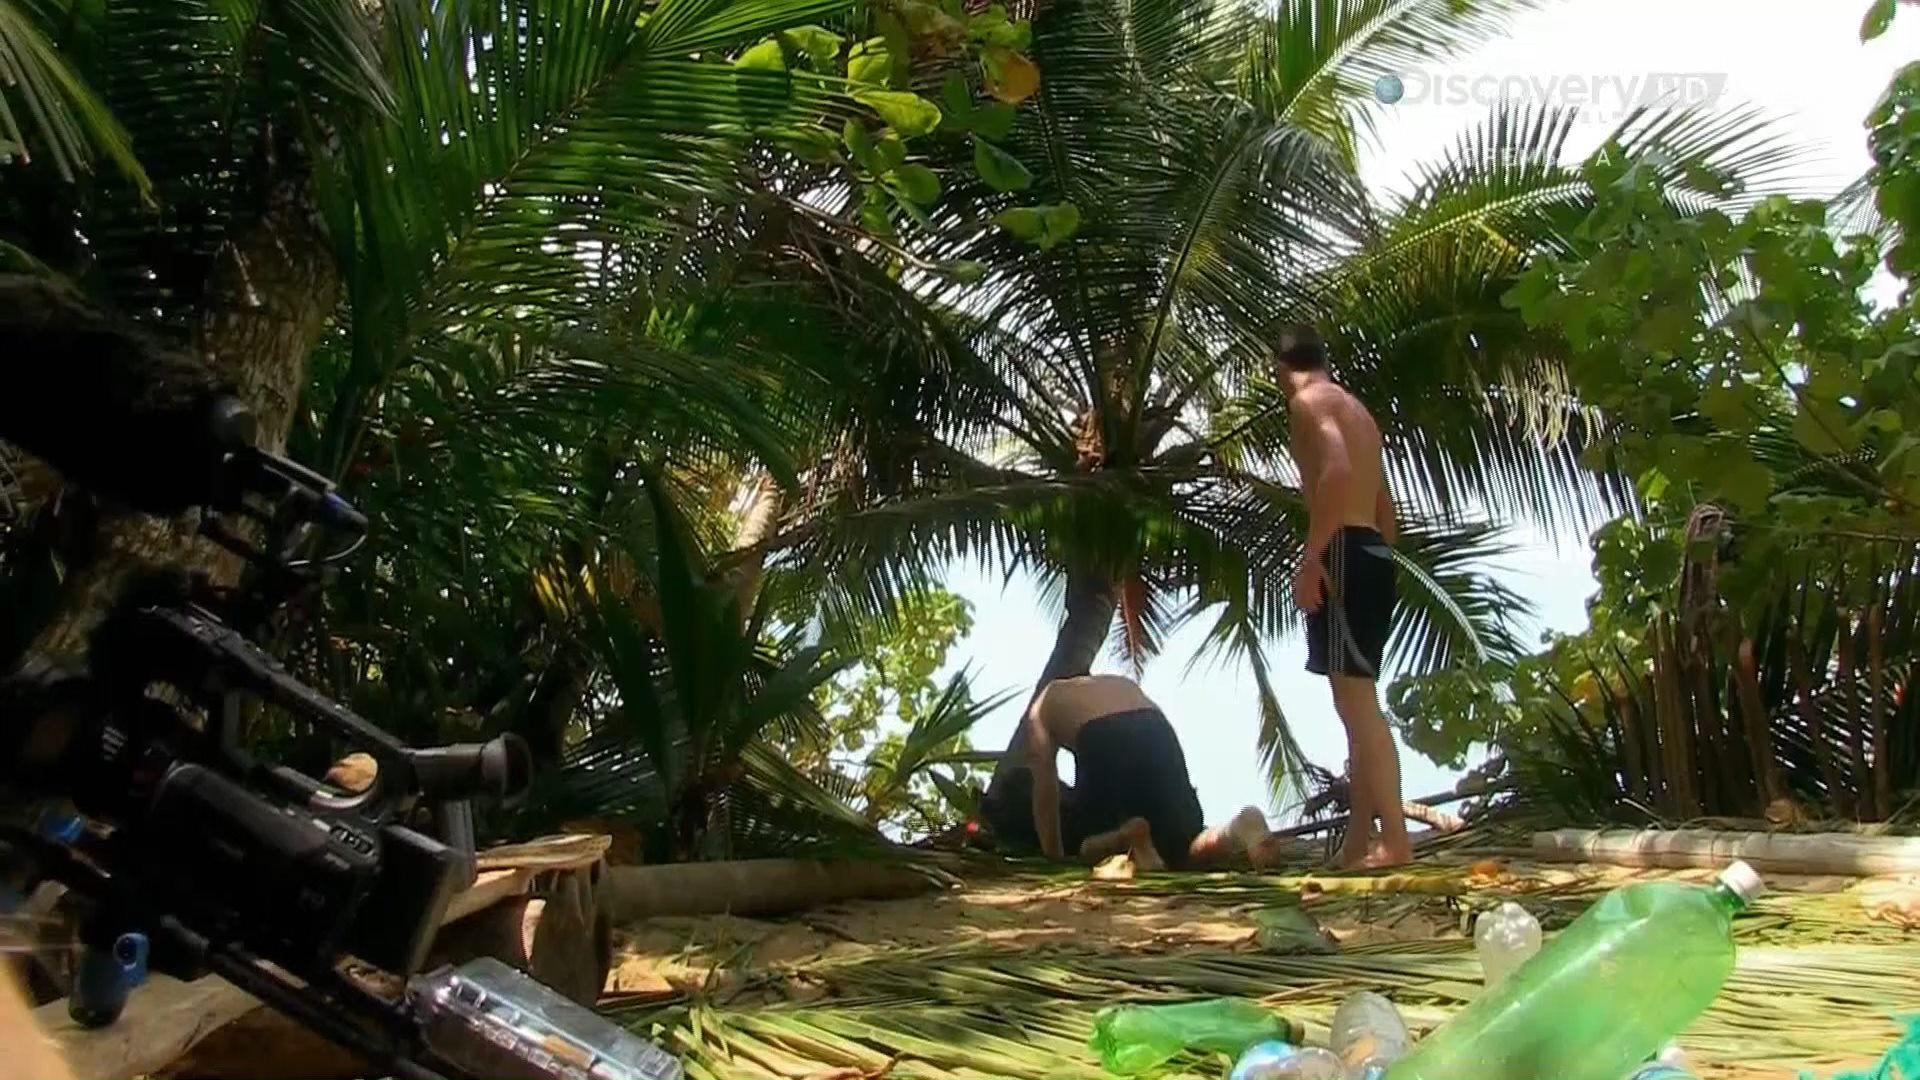 Discovery. Остров с Беаром Гриллсом / The Island with Bear Grylls (1-6 серии из 6) (2014) HDTV 1080i